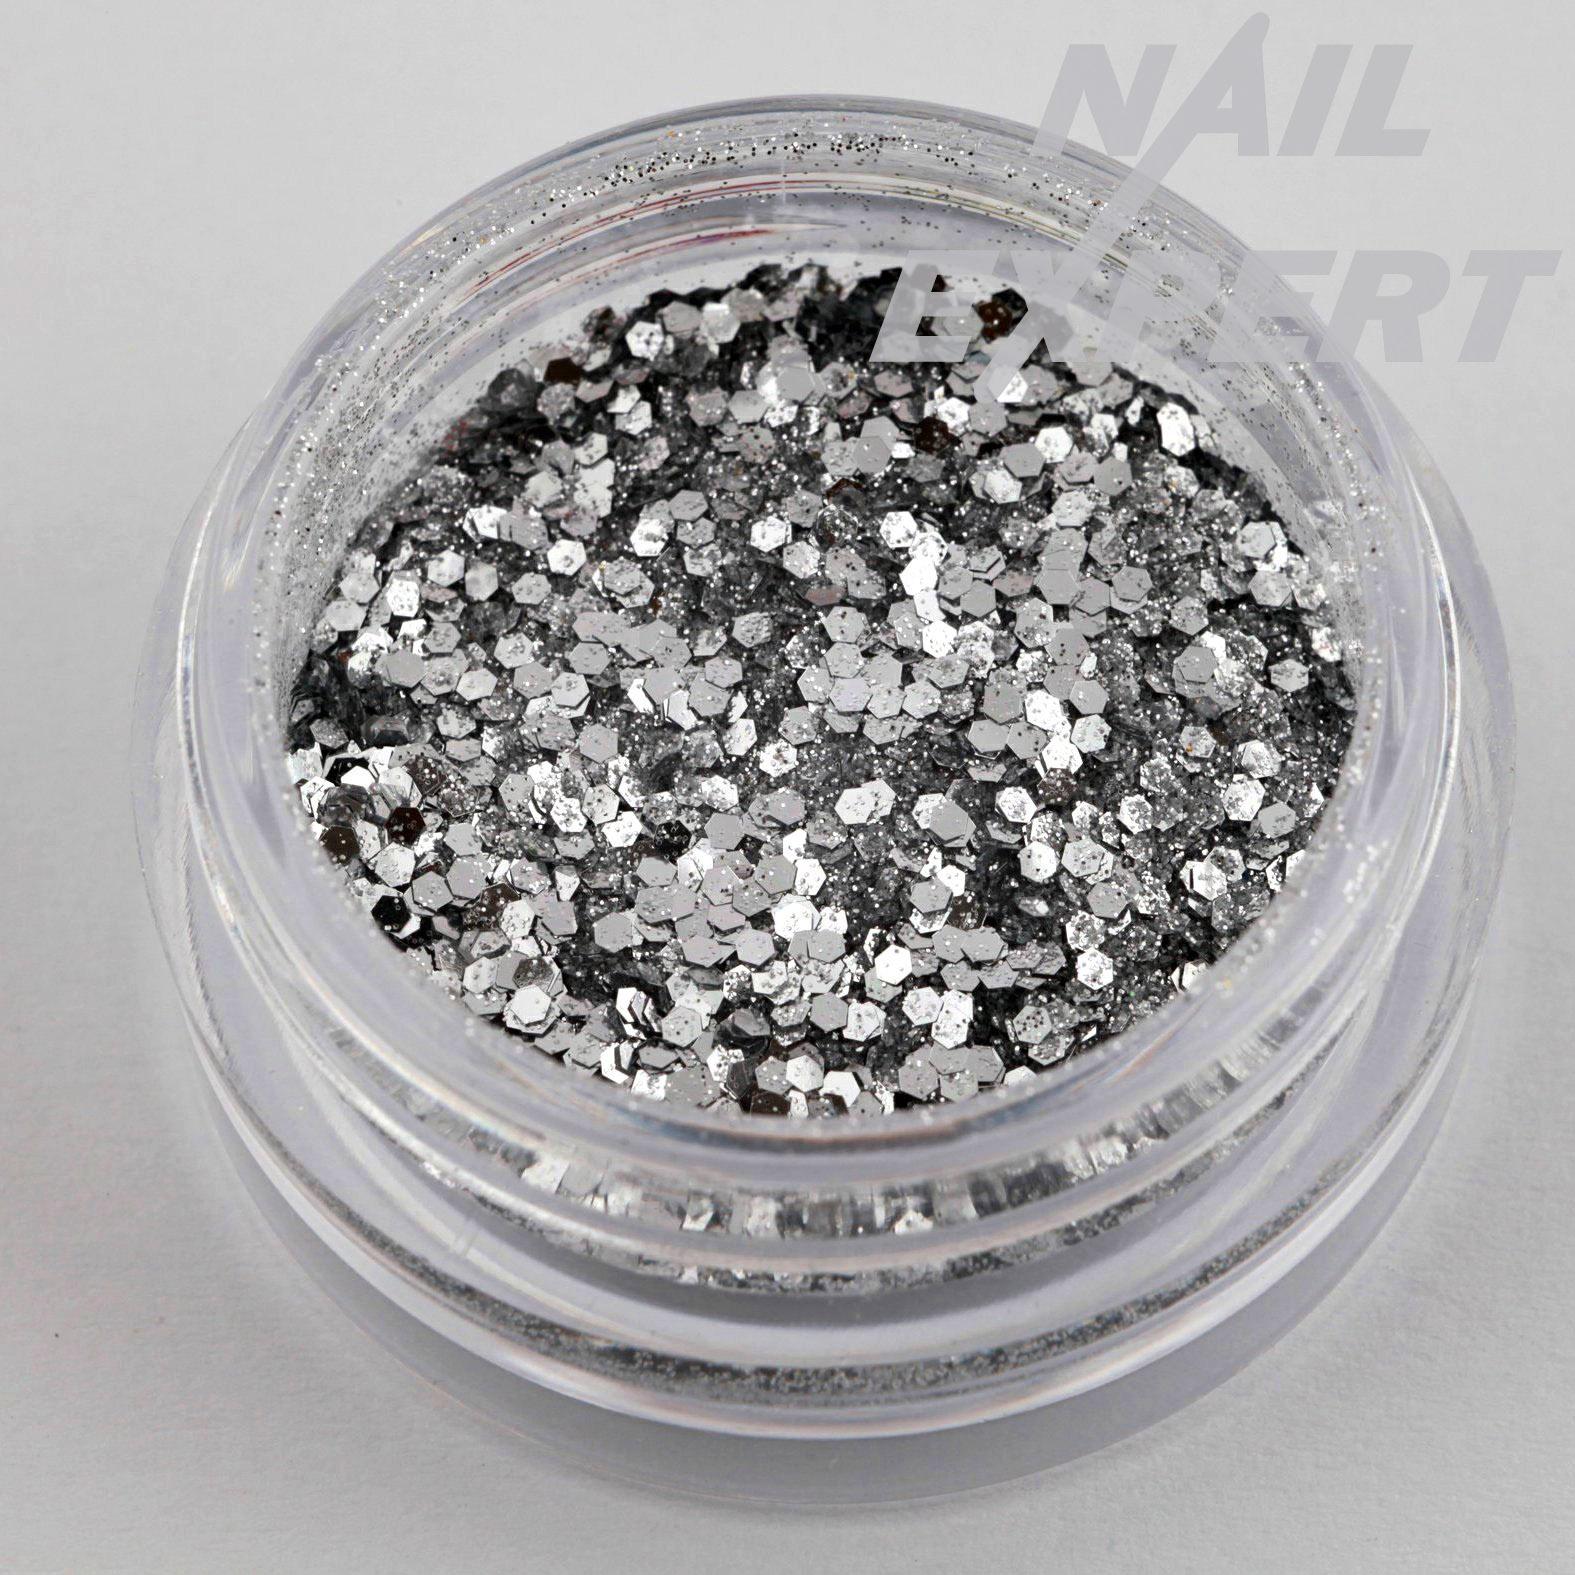 Nail Expert Sparkling glitter 1008